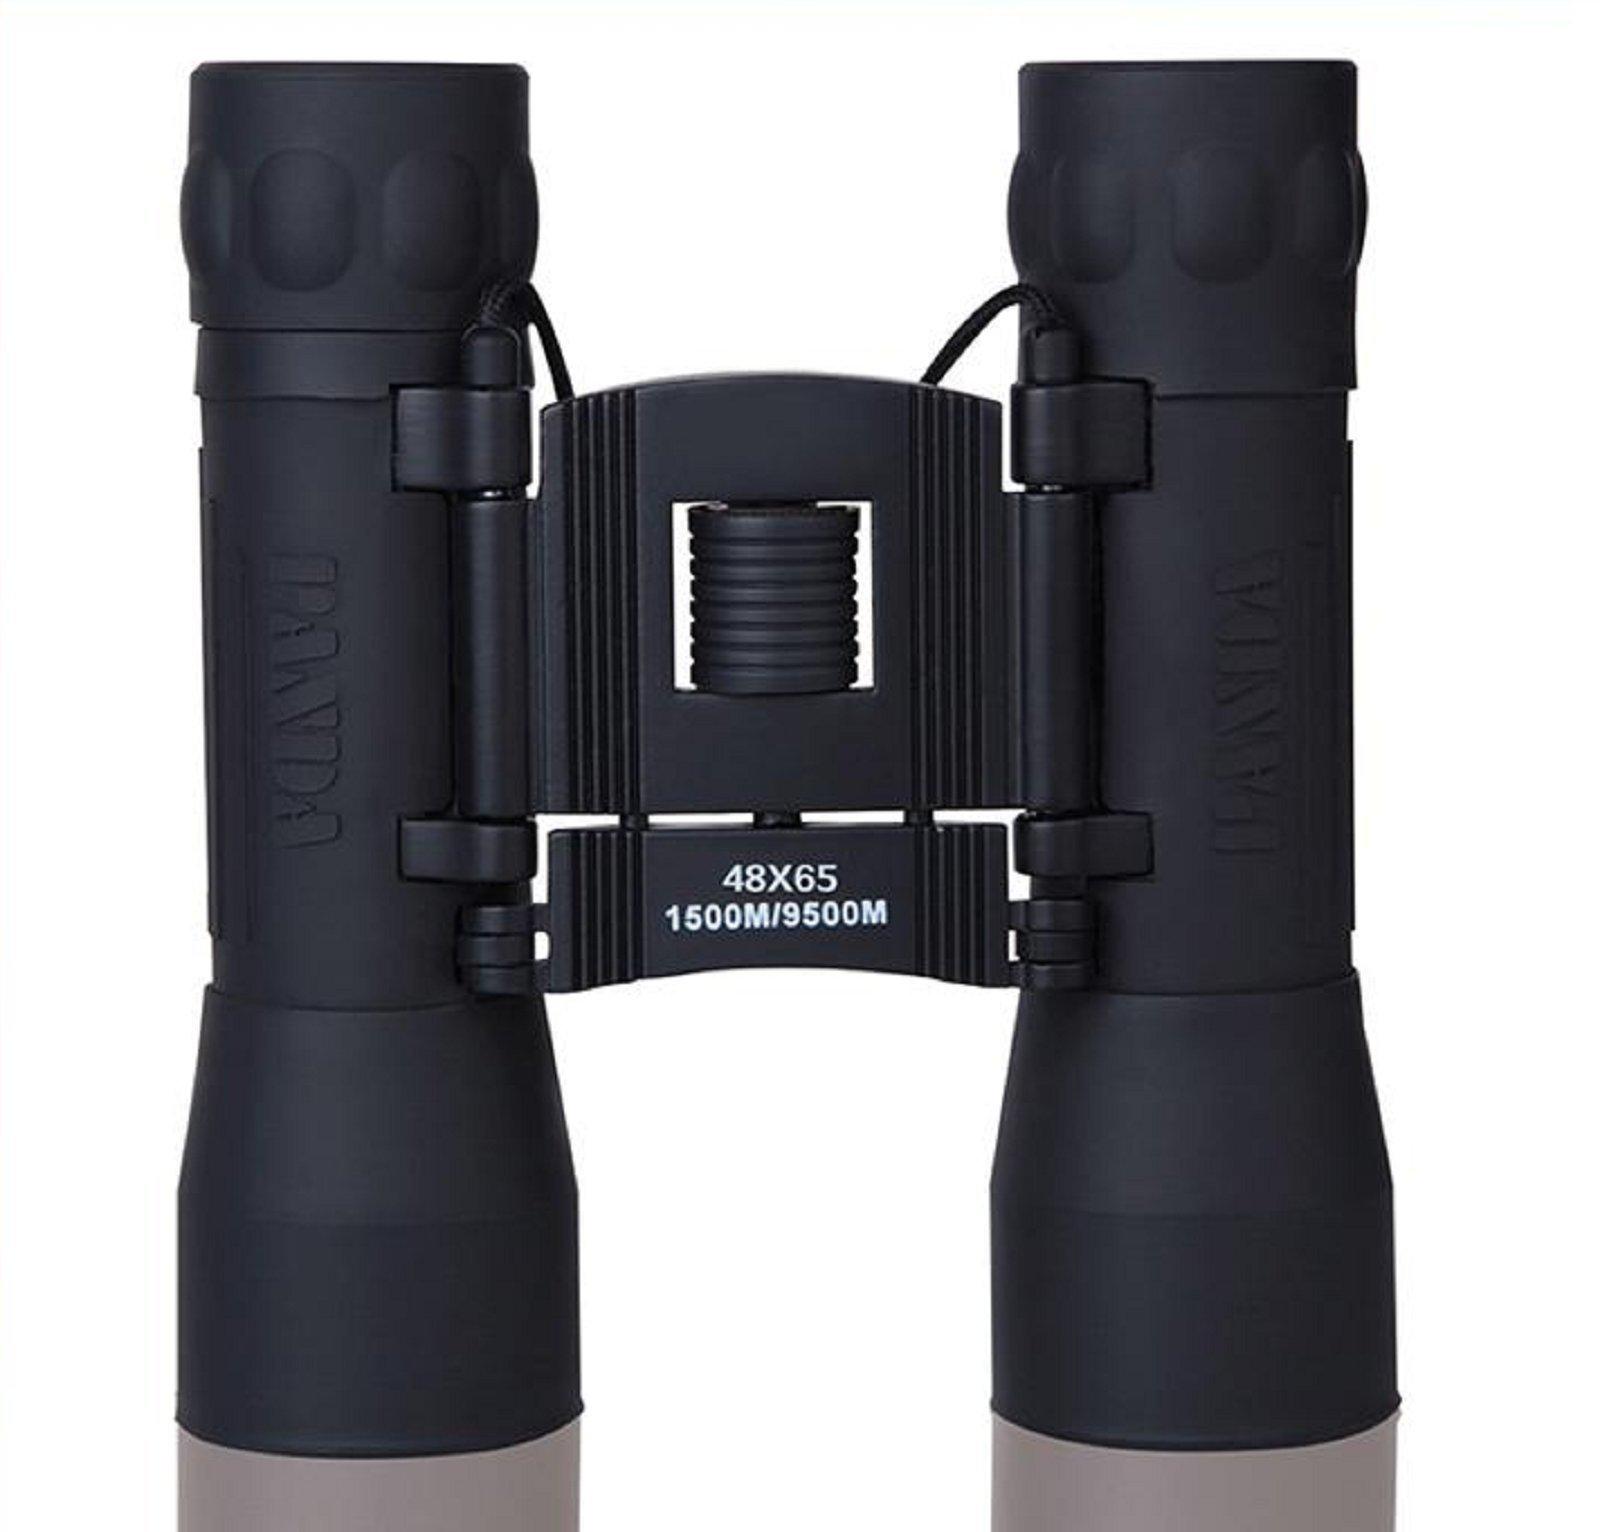 48 * 65 Binoculars, HD Binoculars,match Essential Telescope Military Vision Binoculars by Polarbear's Shop